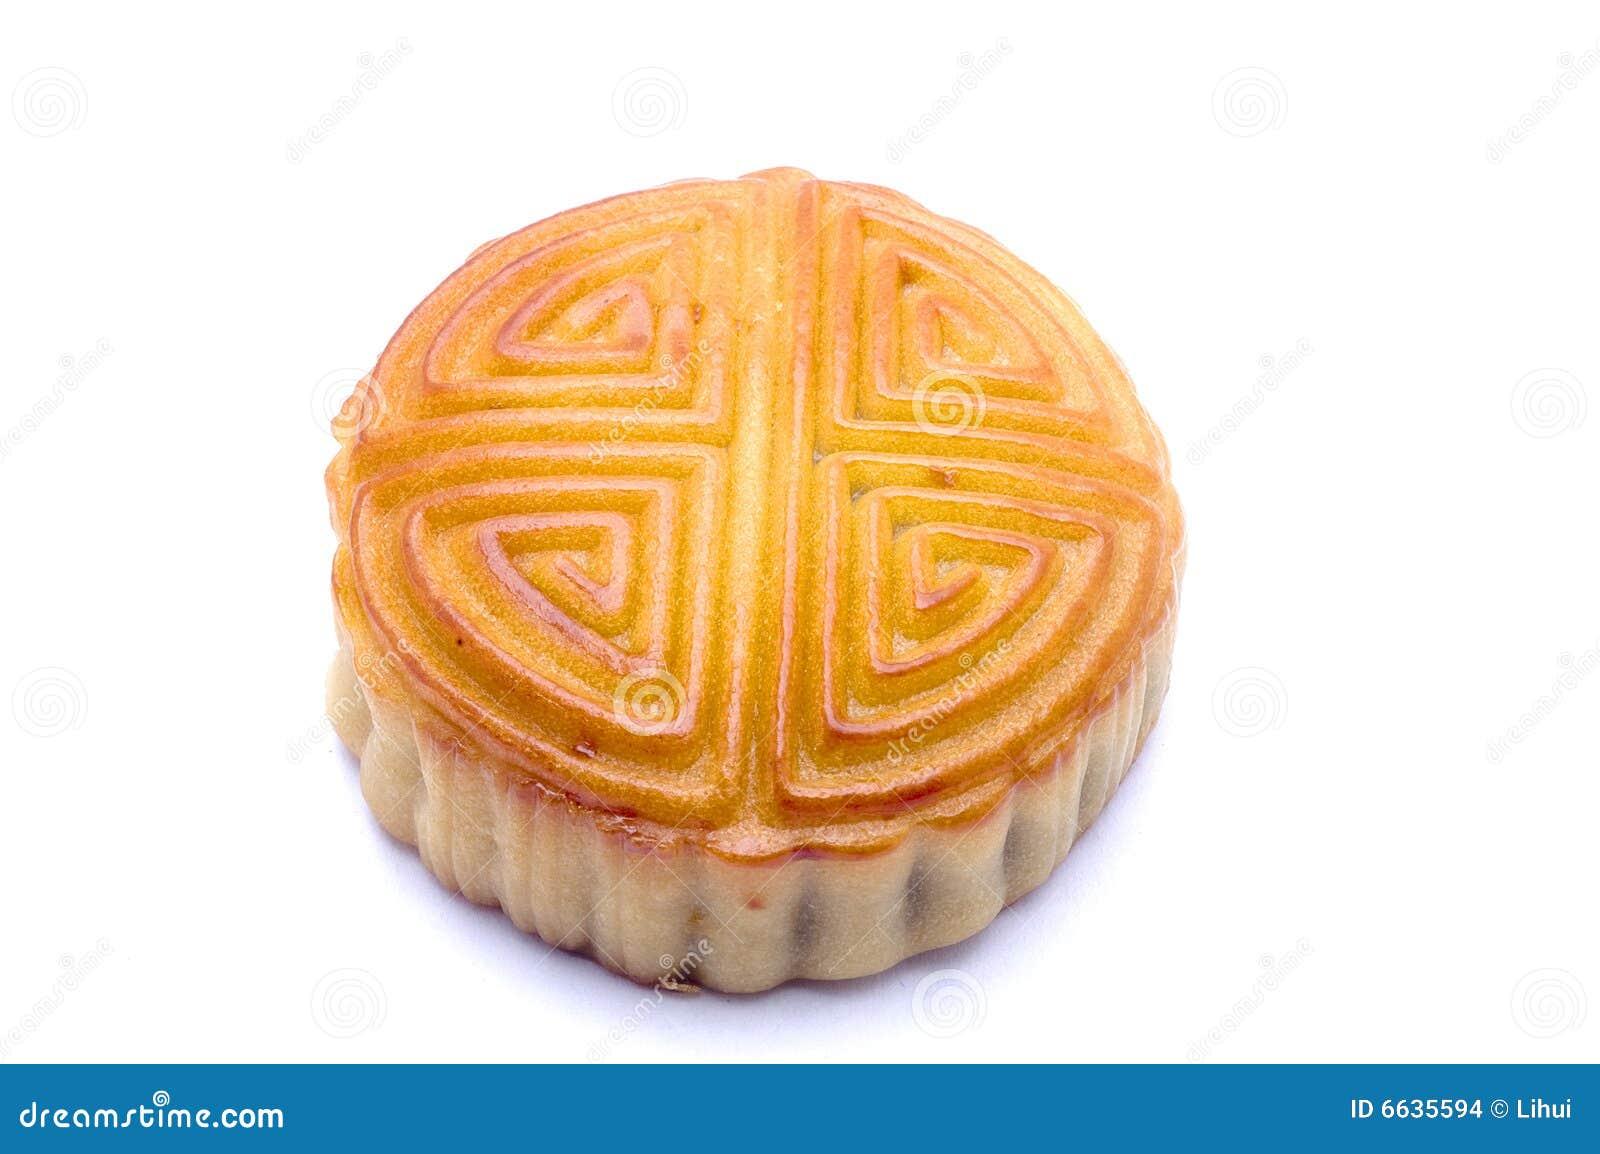 Moon Cake Stock Images - Image: 6635594